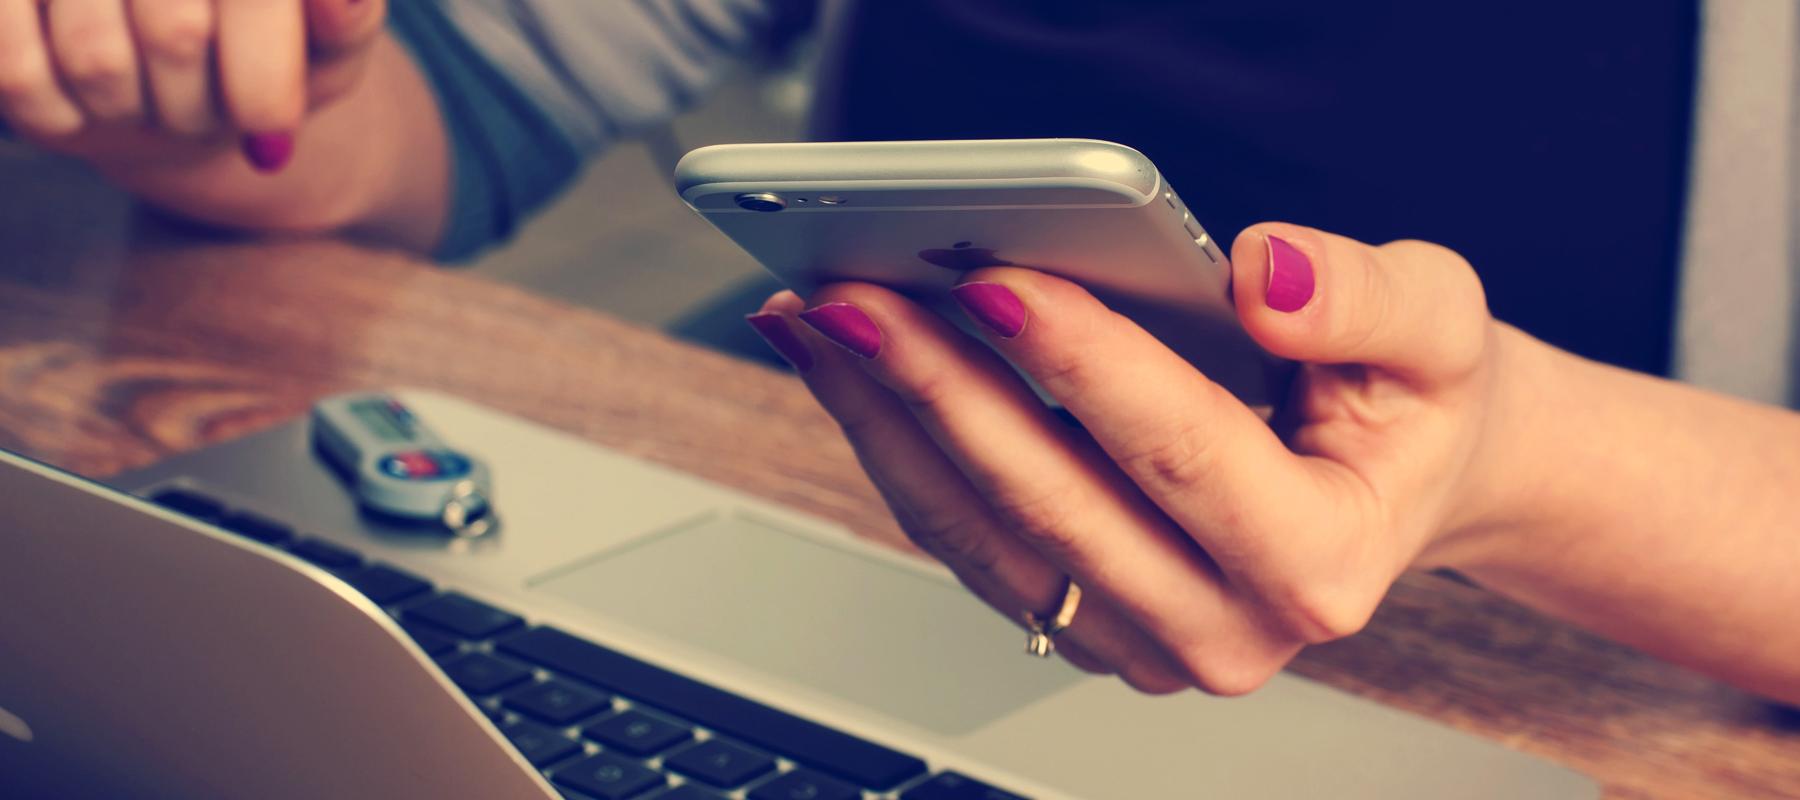 Accediendo un website por celular